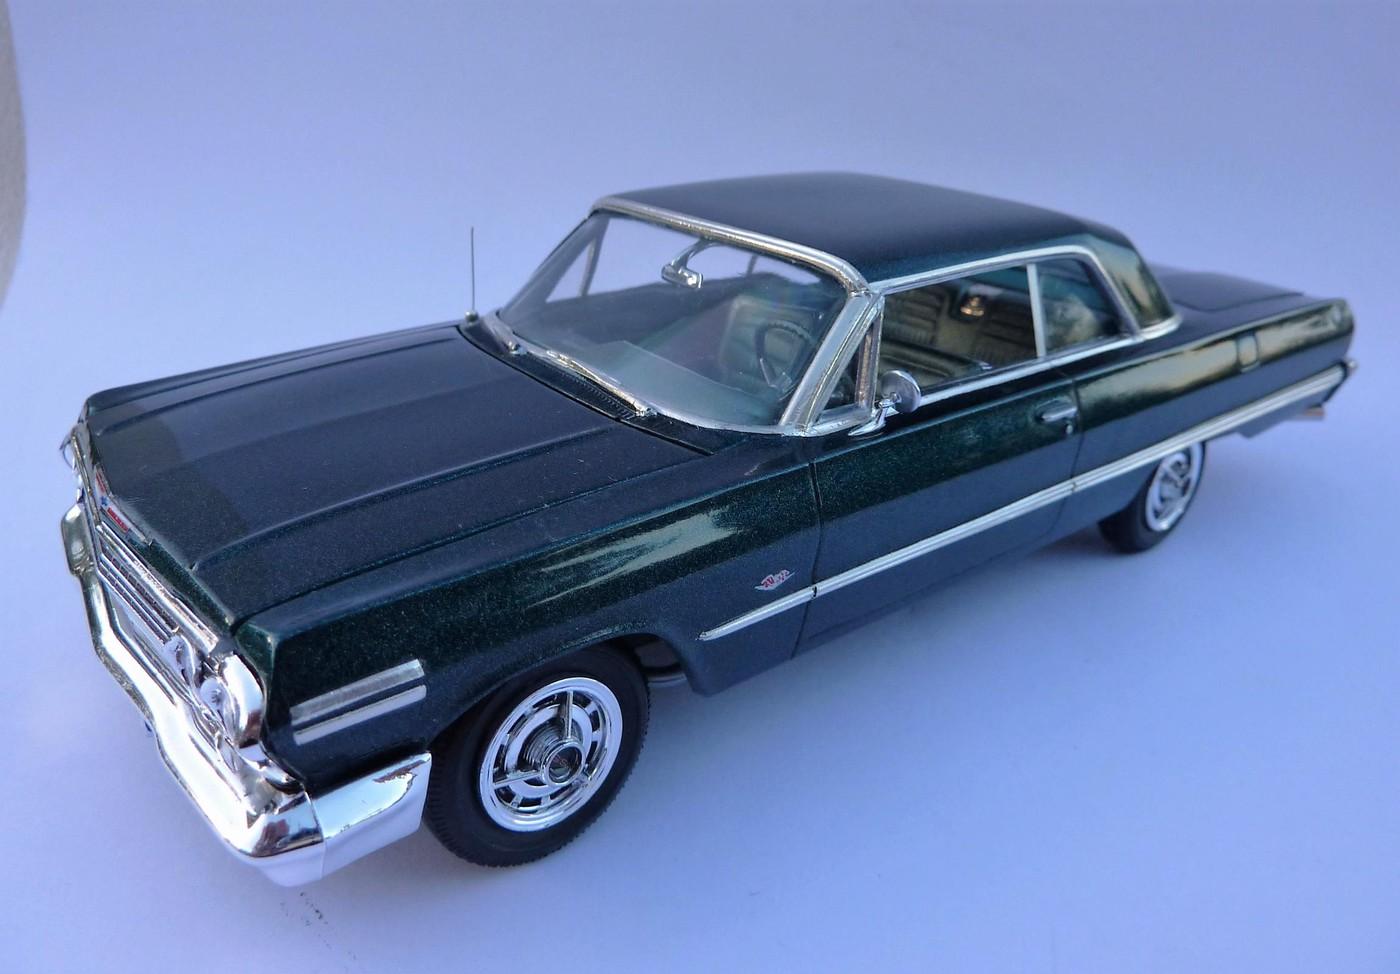 Chevrolet Impala 63 terminée - Page 2 Photo21-vi